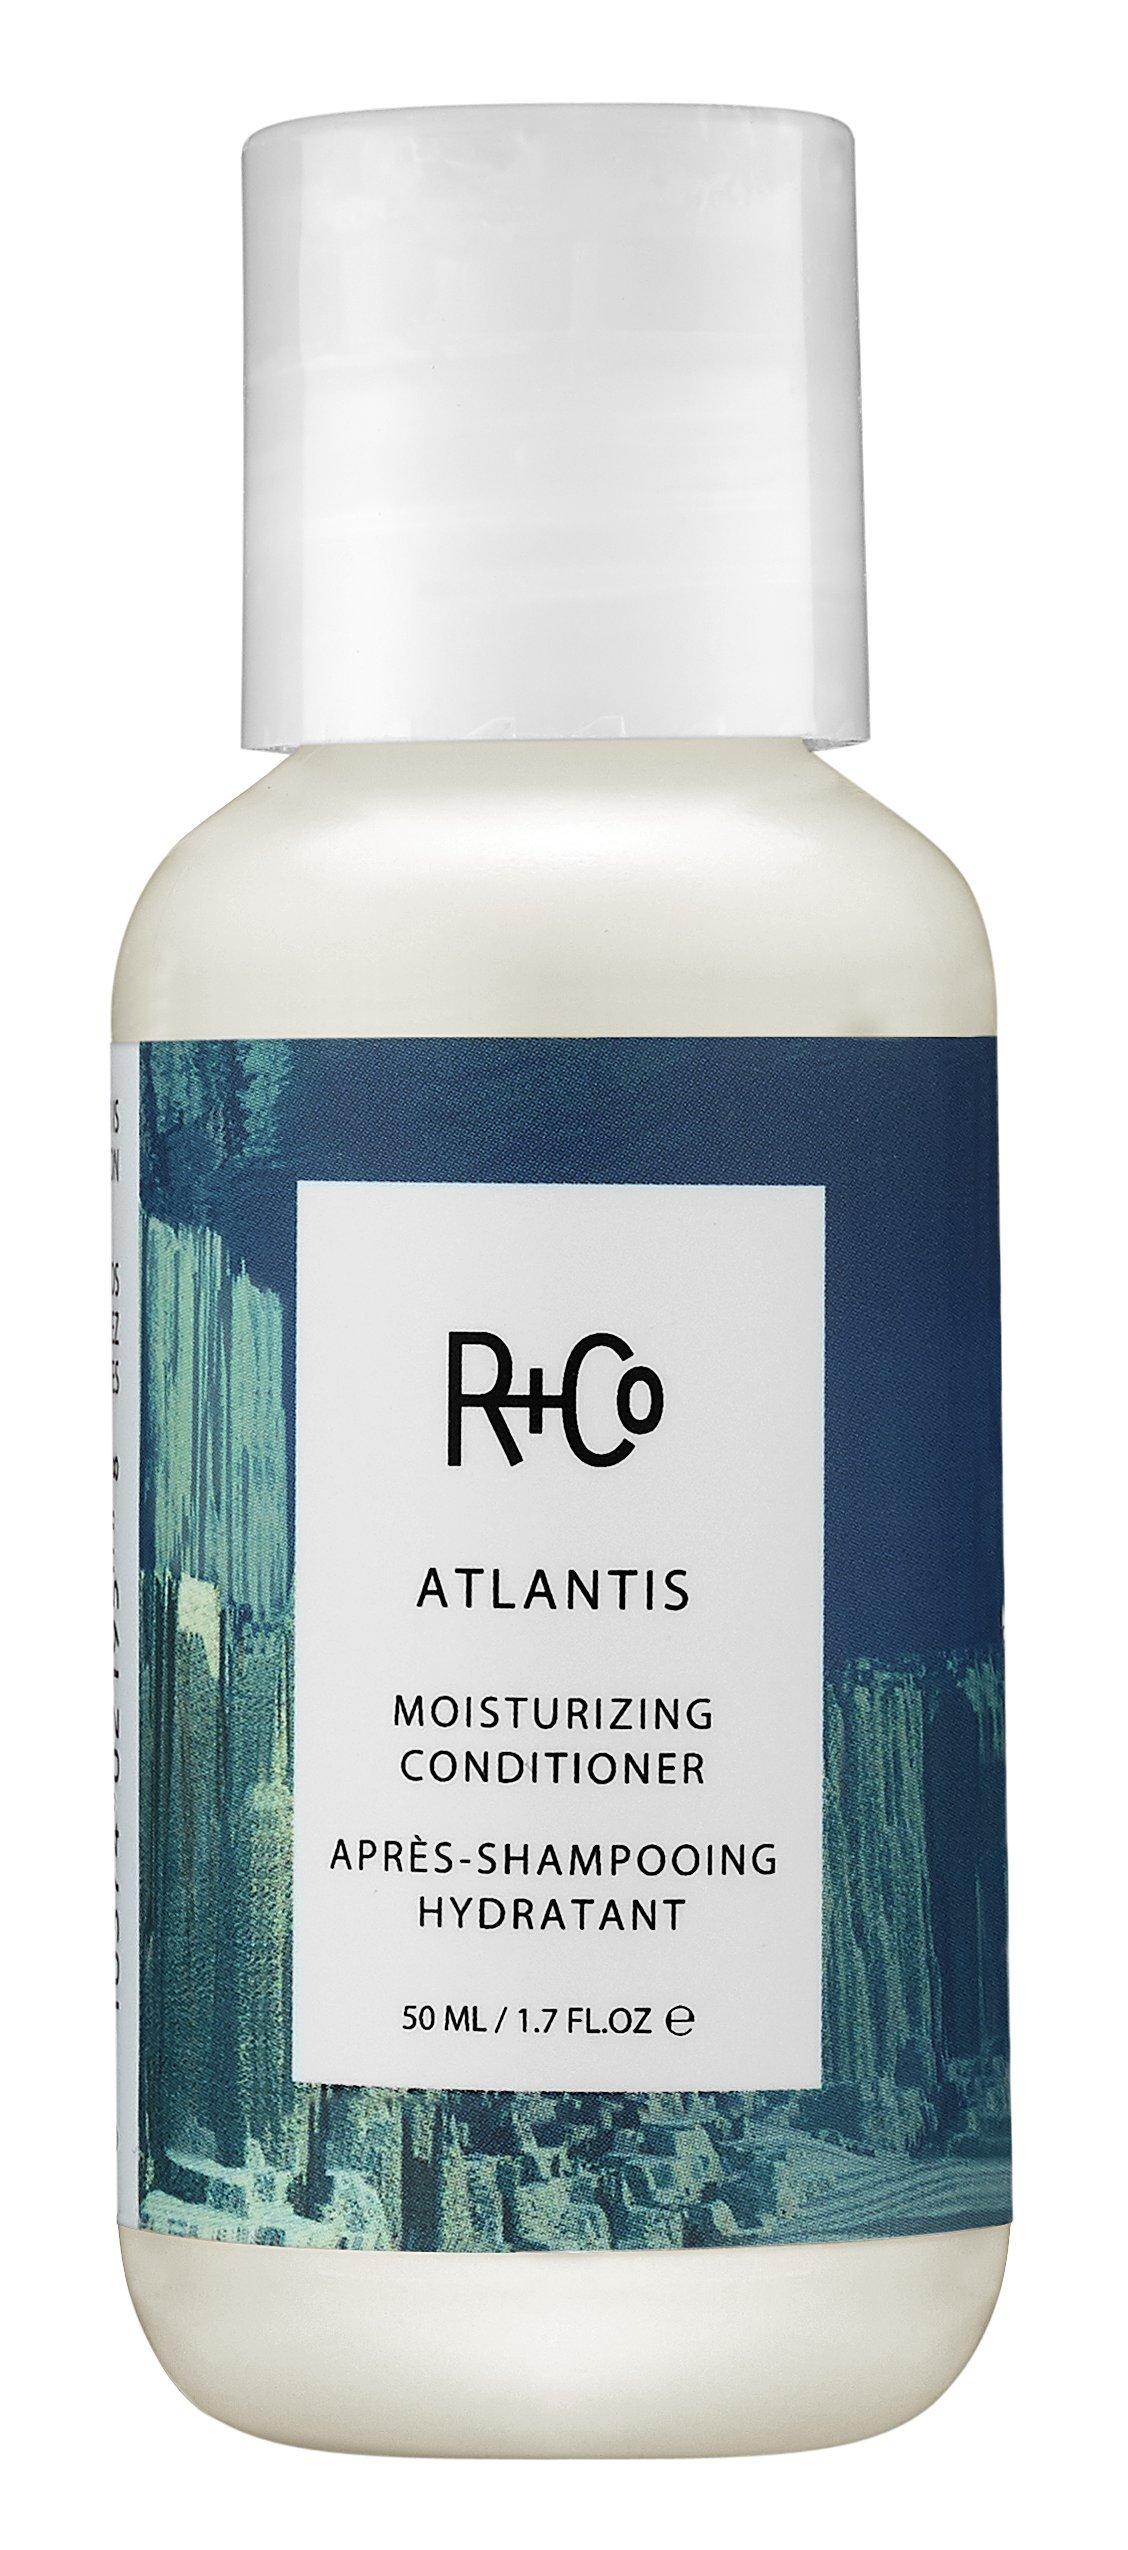 R+Co Atlantis Moisturizing Conditioner Travel, 1.7 oz.